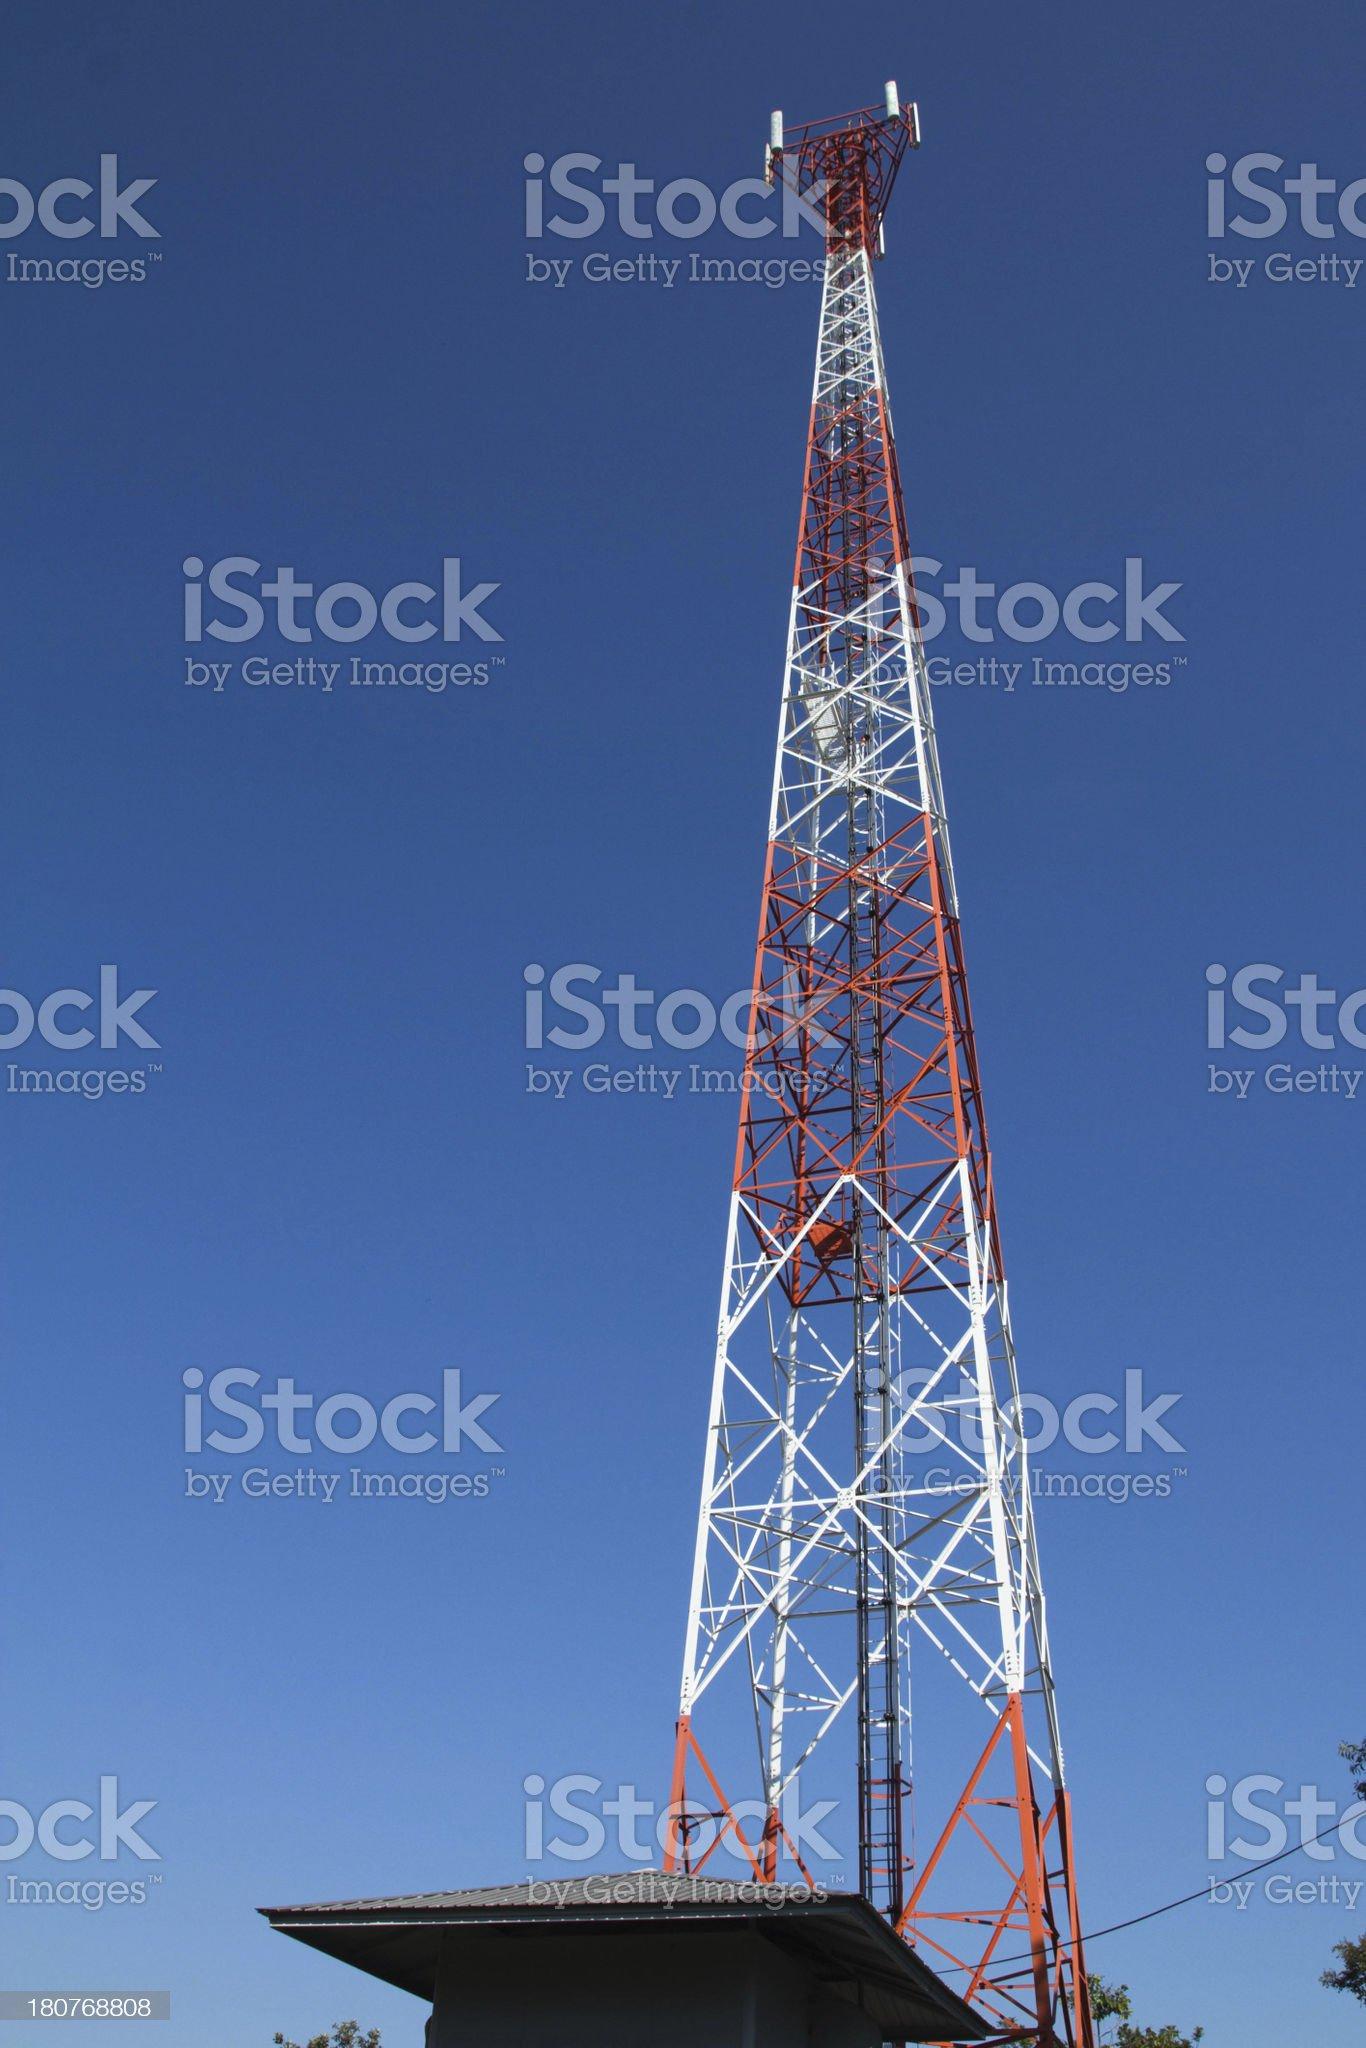 Telephone poles royalty-free stock photo